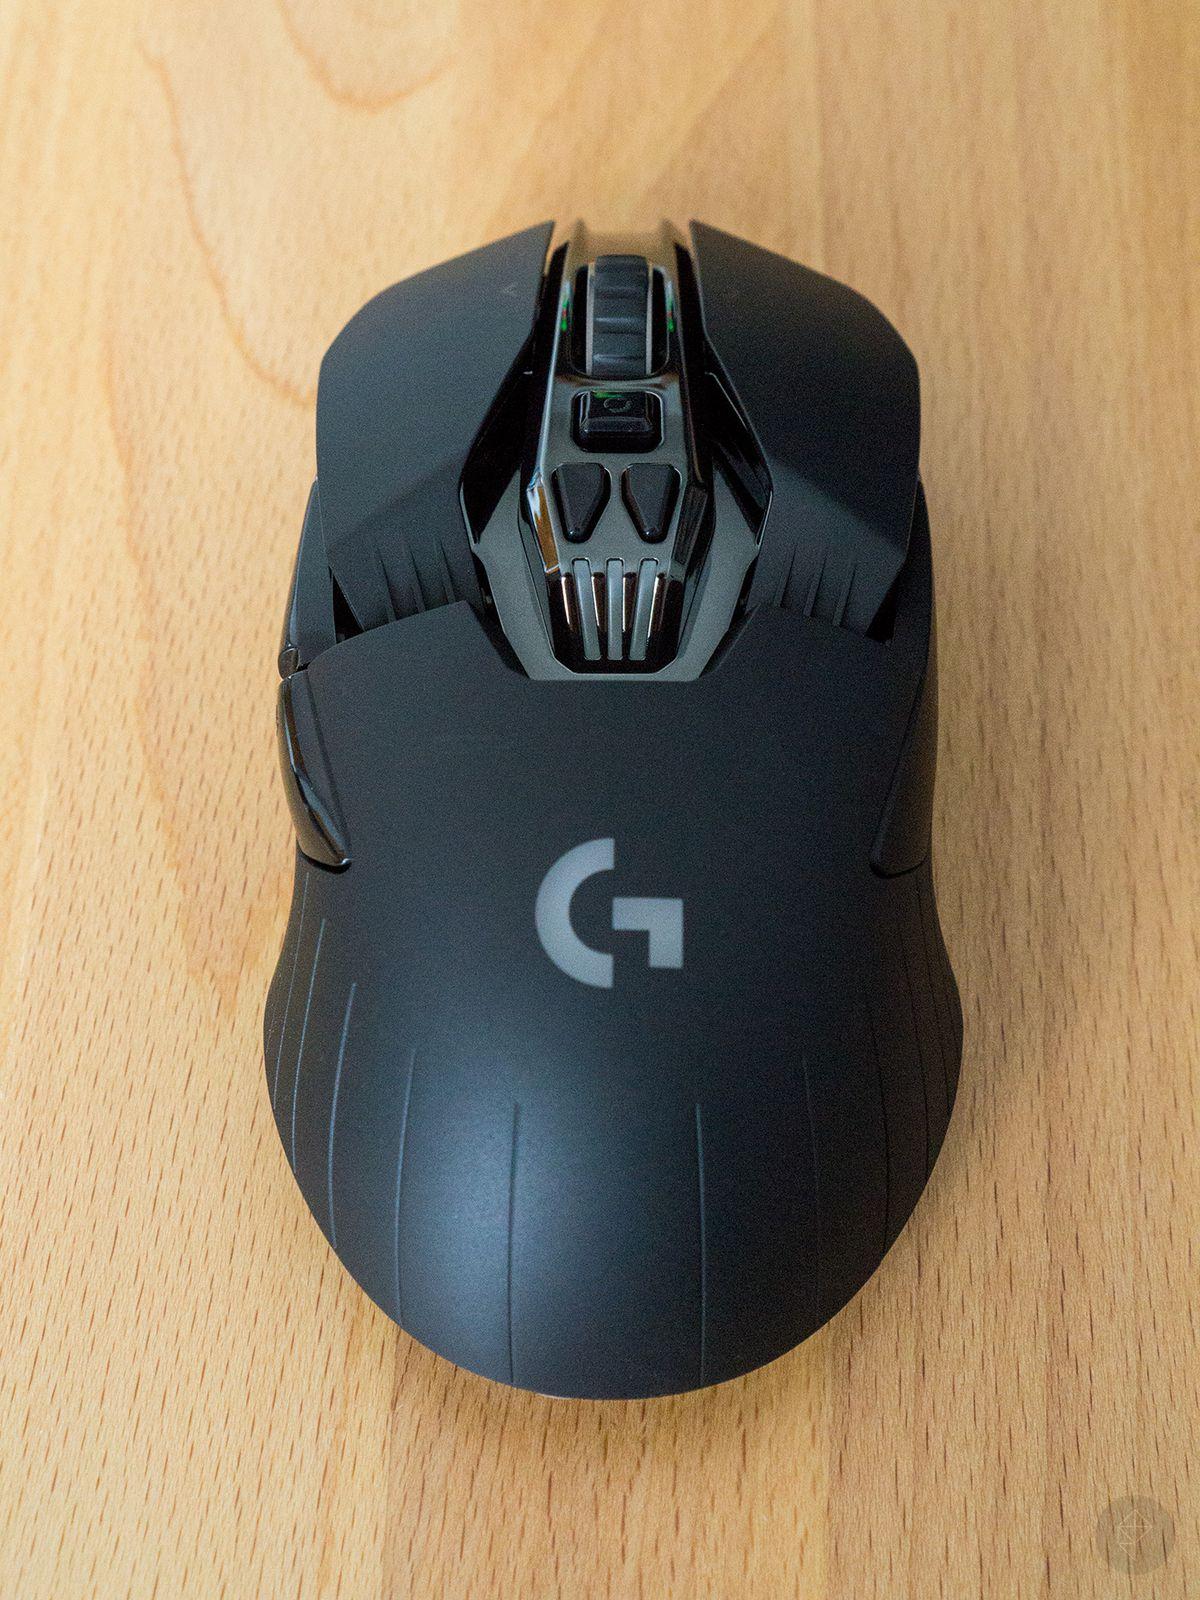 Logitech G900 photo 02 (Poly wm) 1440